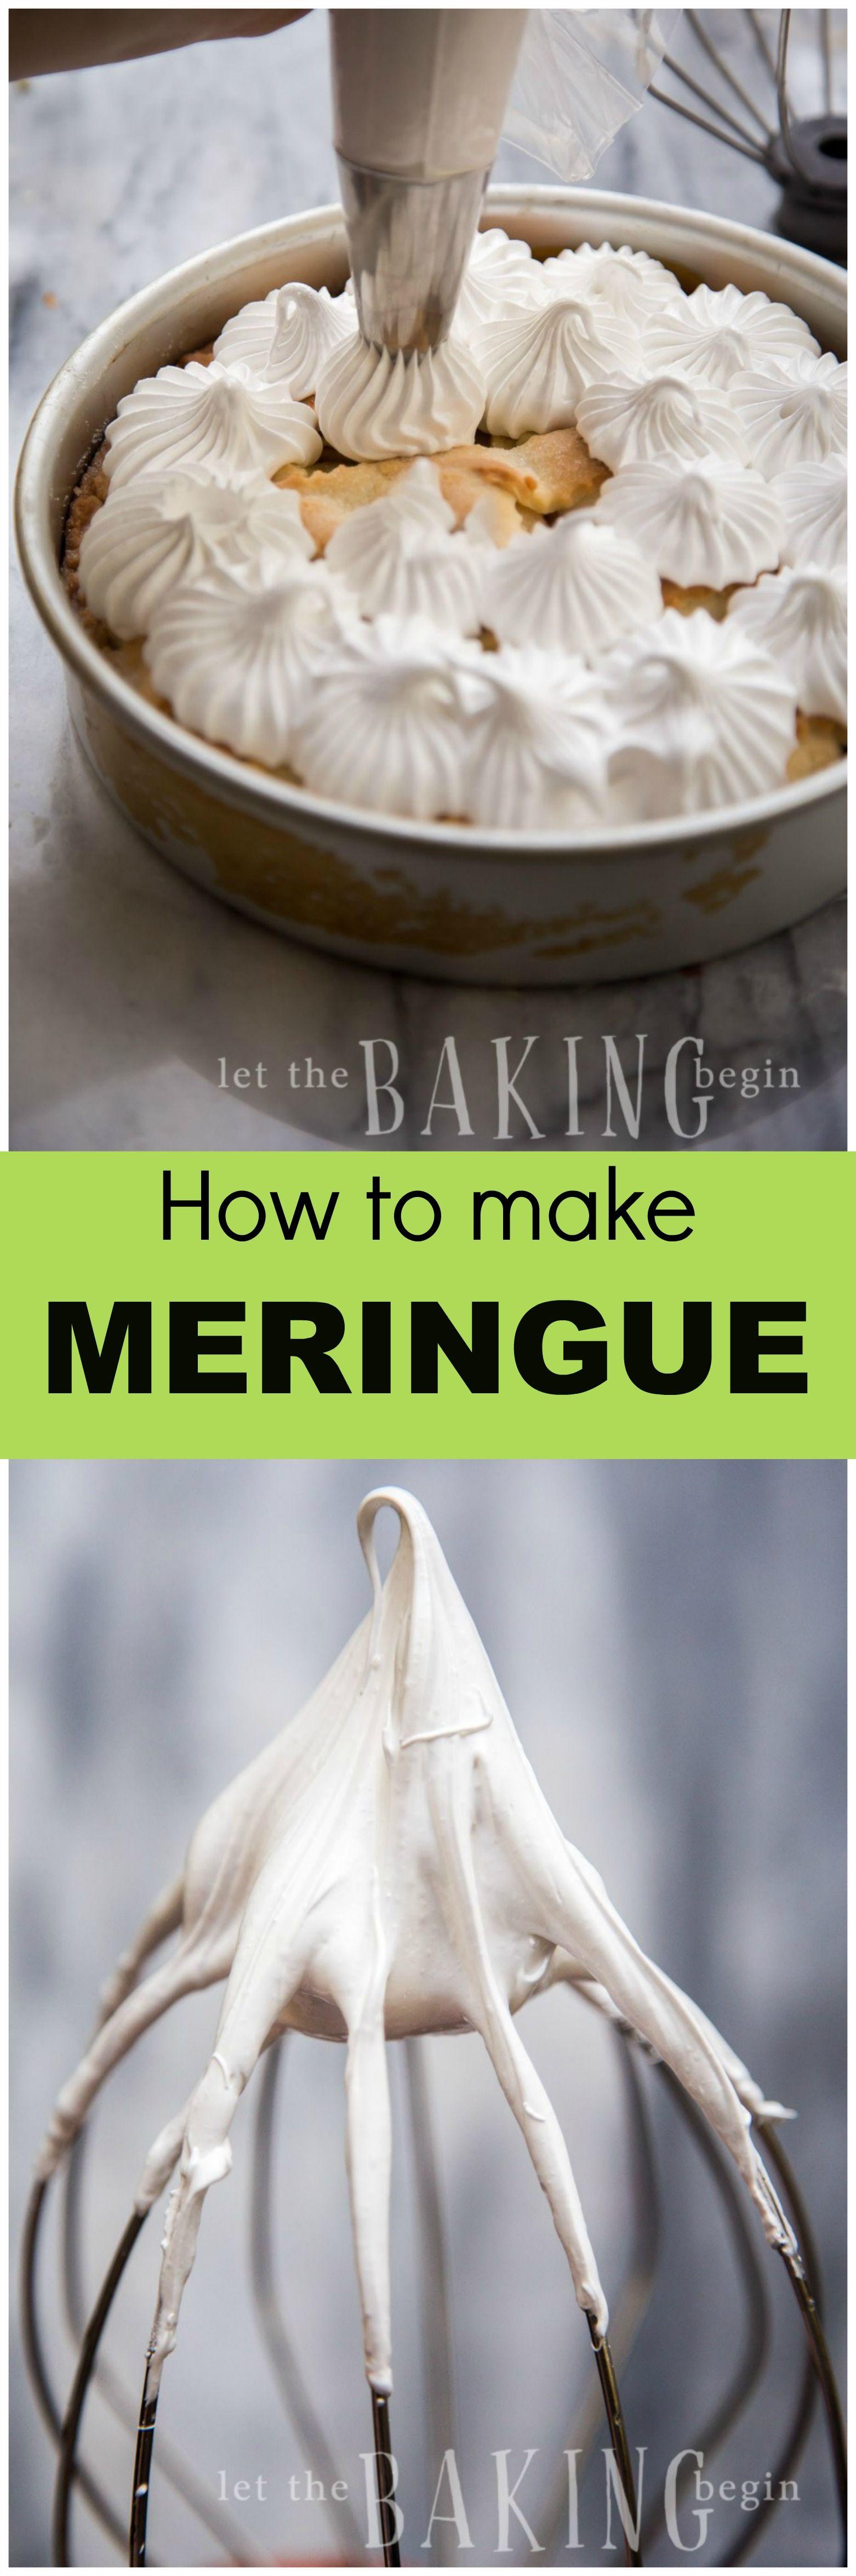 Easy 2 ingredient meringue for baking incredible desserts | Let the